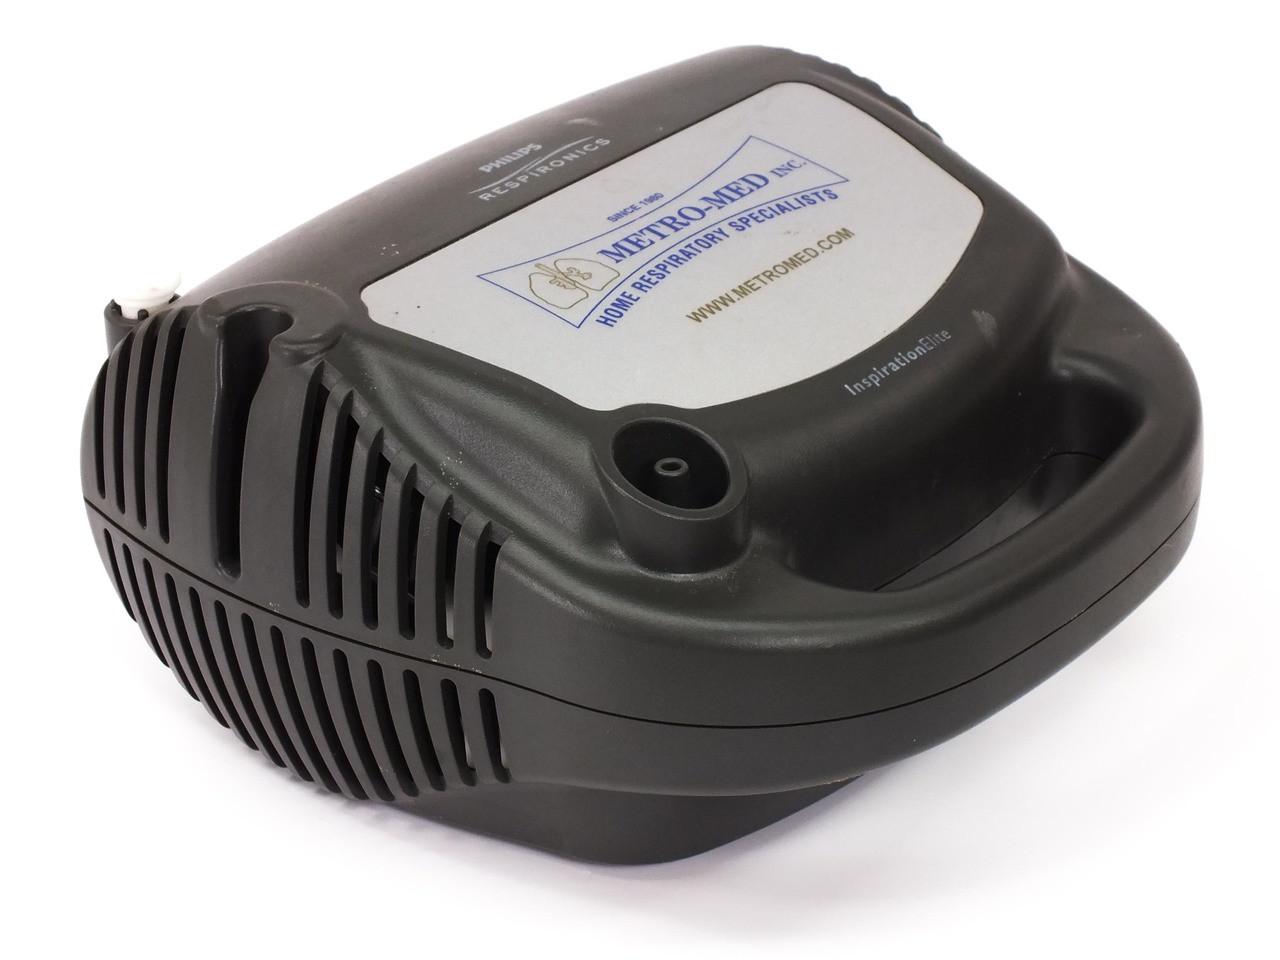 philips respironics hs456 inspiration elite nebulizer compressor rh recycledgoods com Philips Respironics System One Parts Philips Respironics Nebulizer